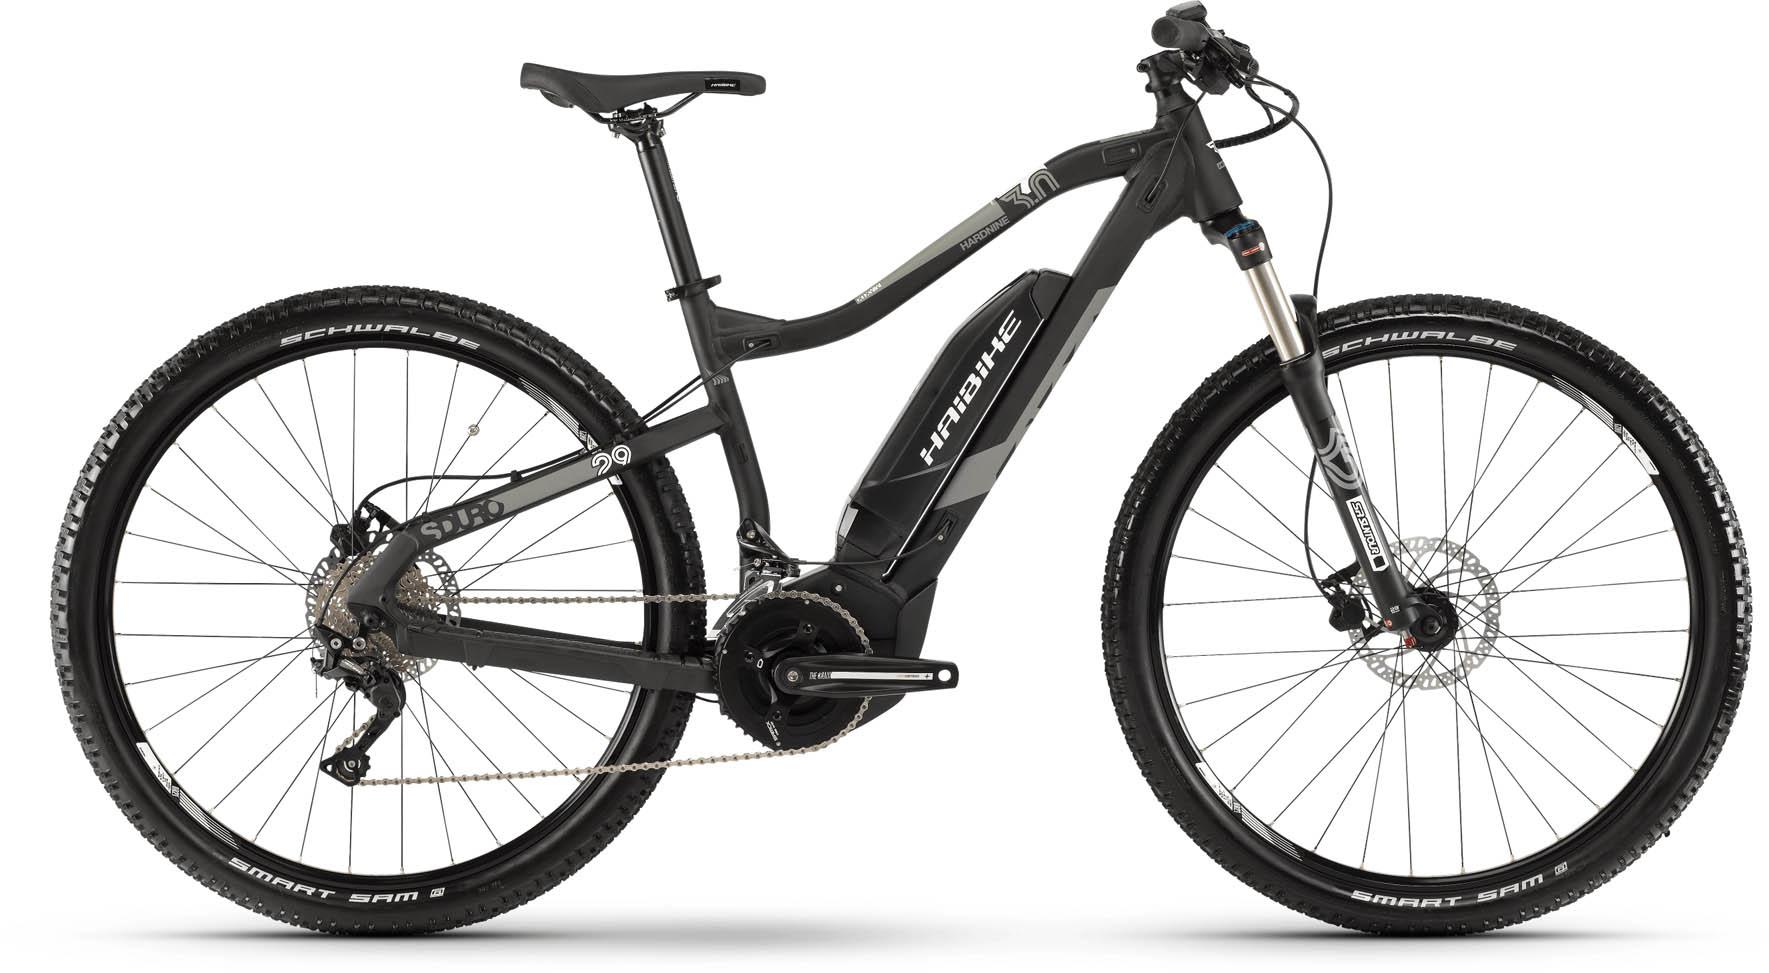 haibike sduro hardnine 3 0 500wh schwarz grau wei e bike. Black Bedroom Furniture Sets. Home Design Ideas